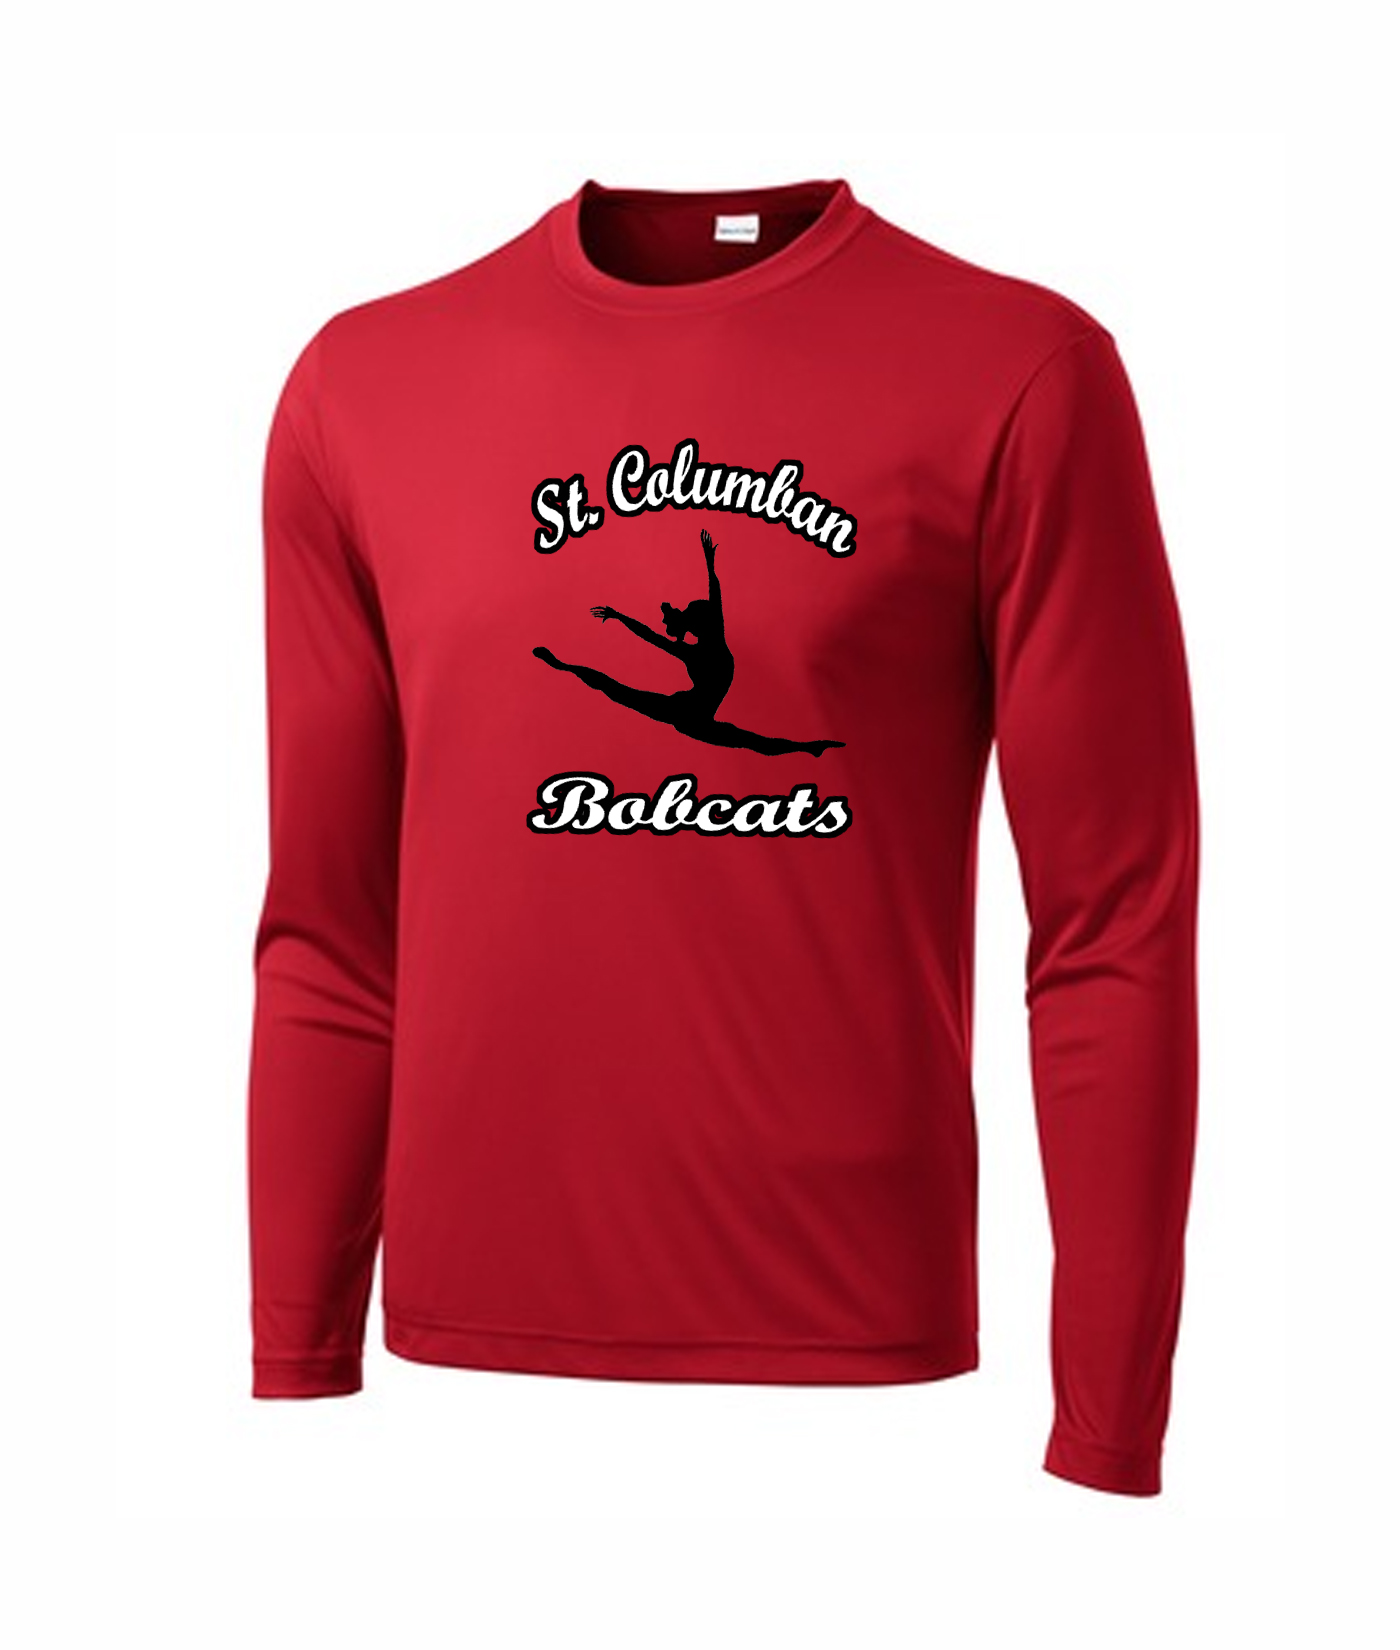 St. Columban Dance Red Performance Active Wear